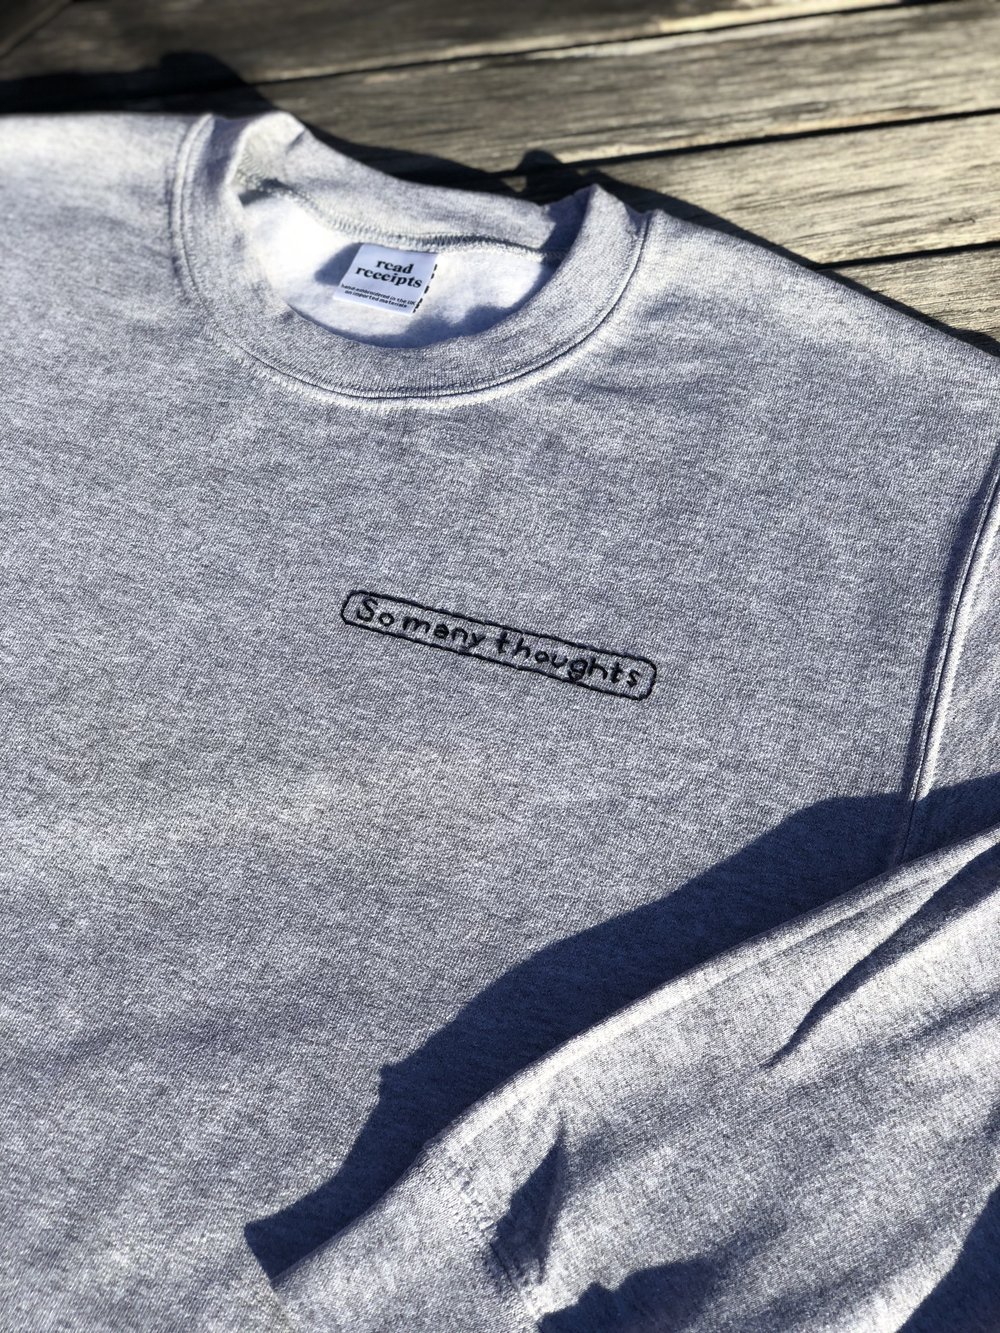 SMTsweatshirt2.jpg